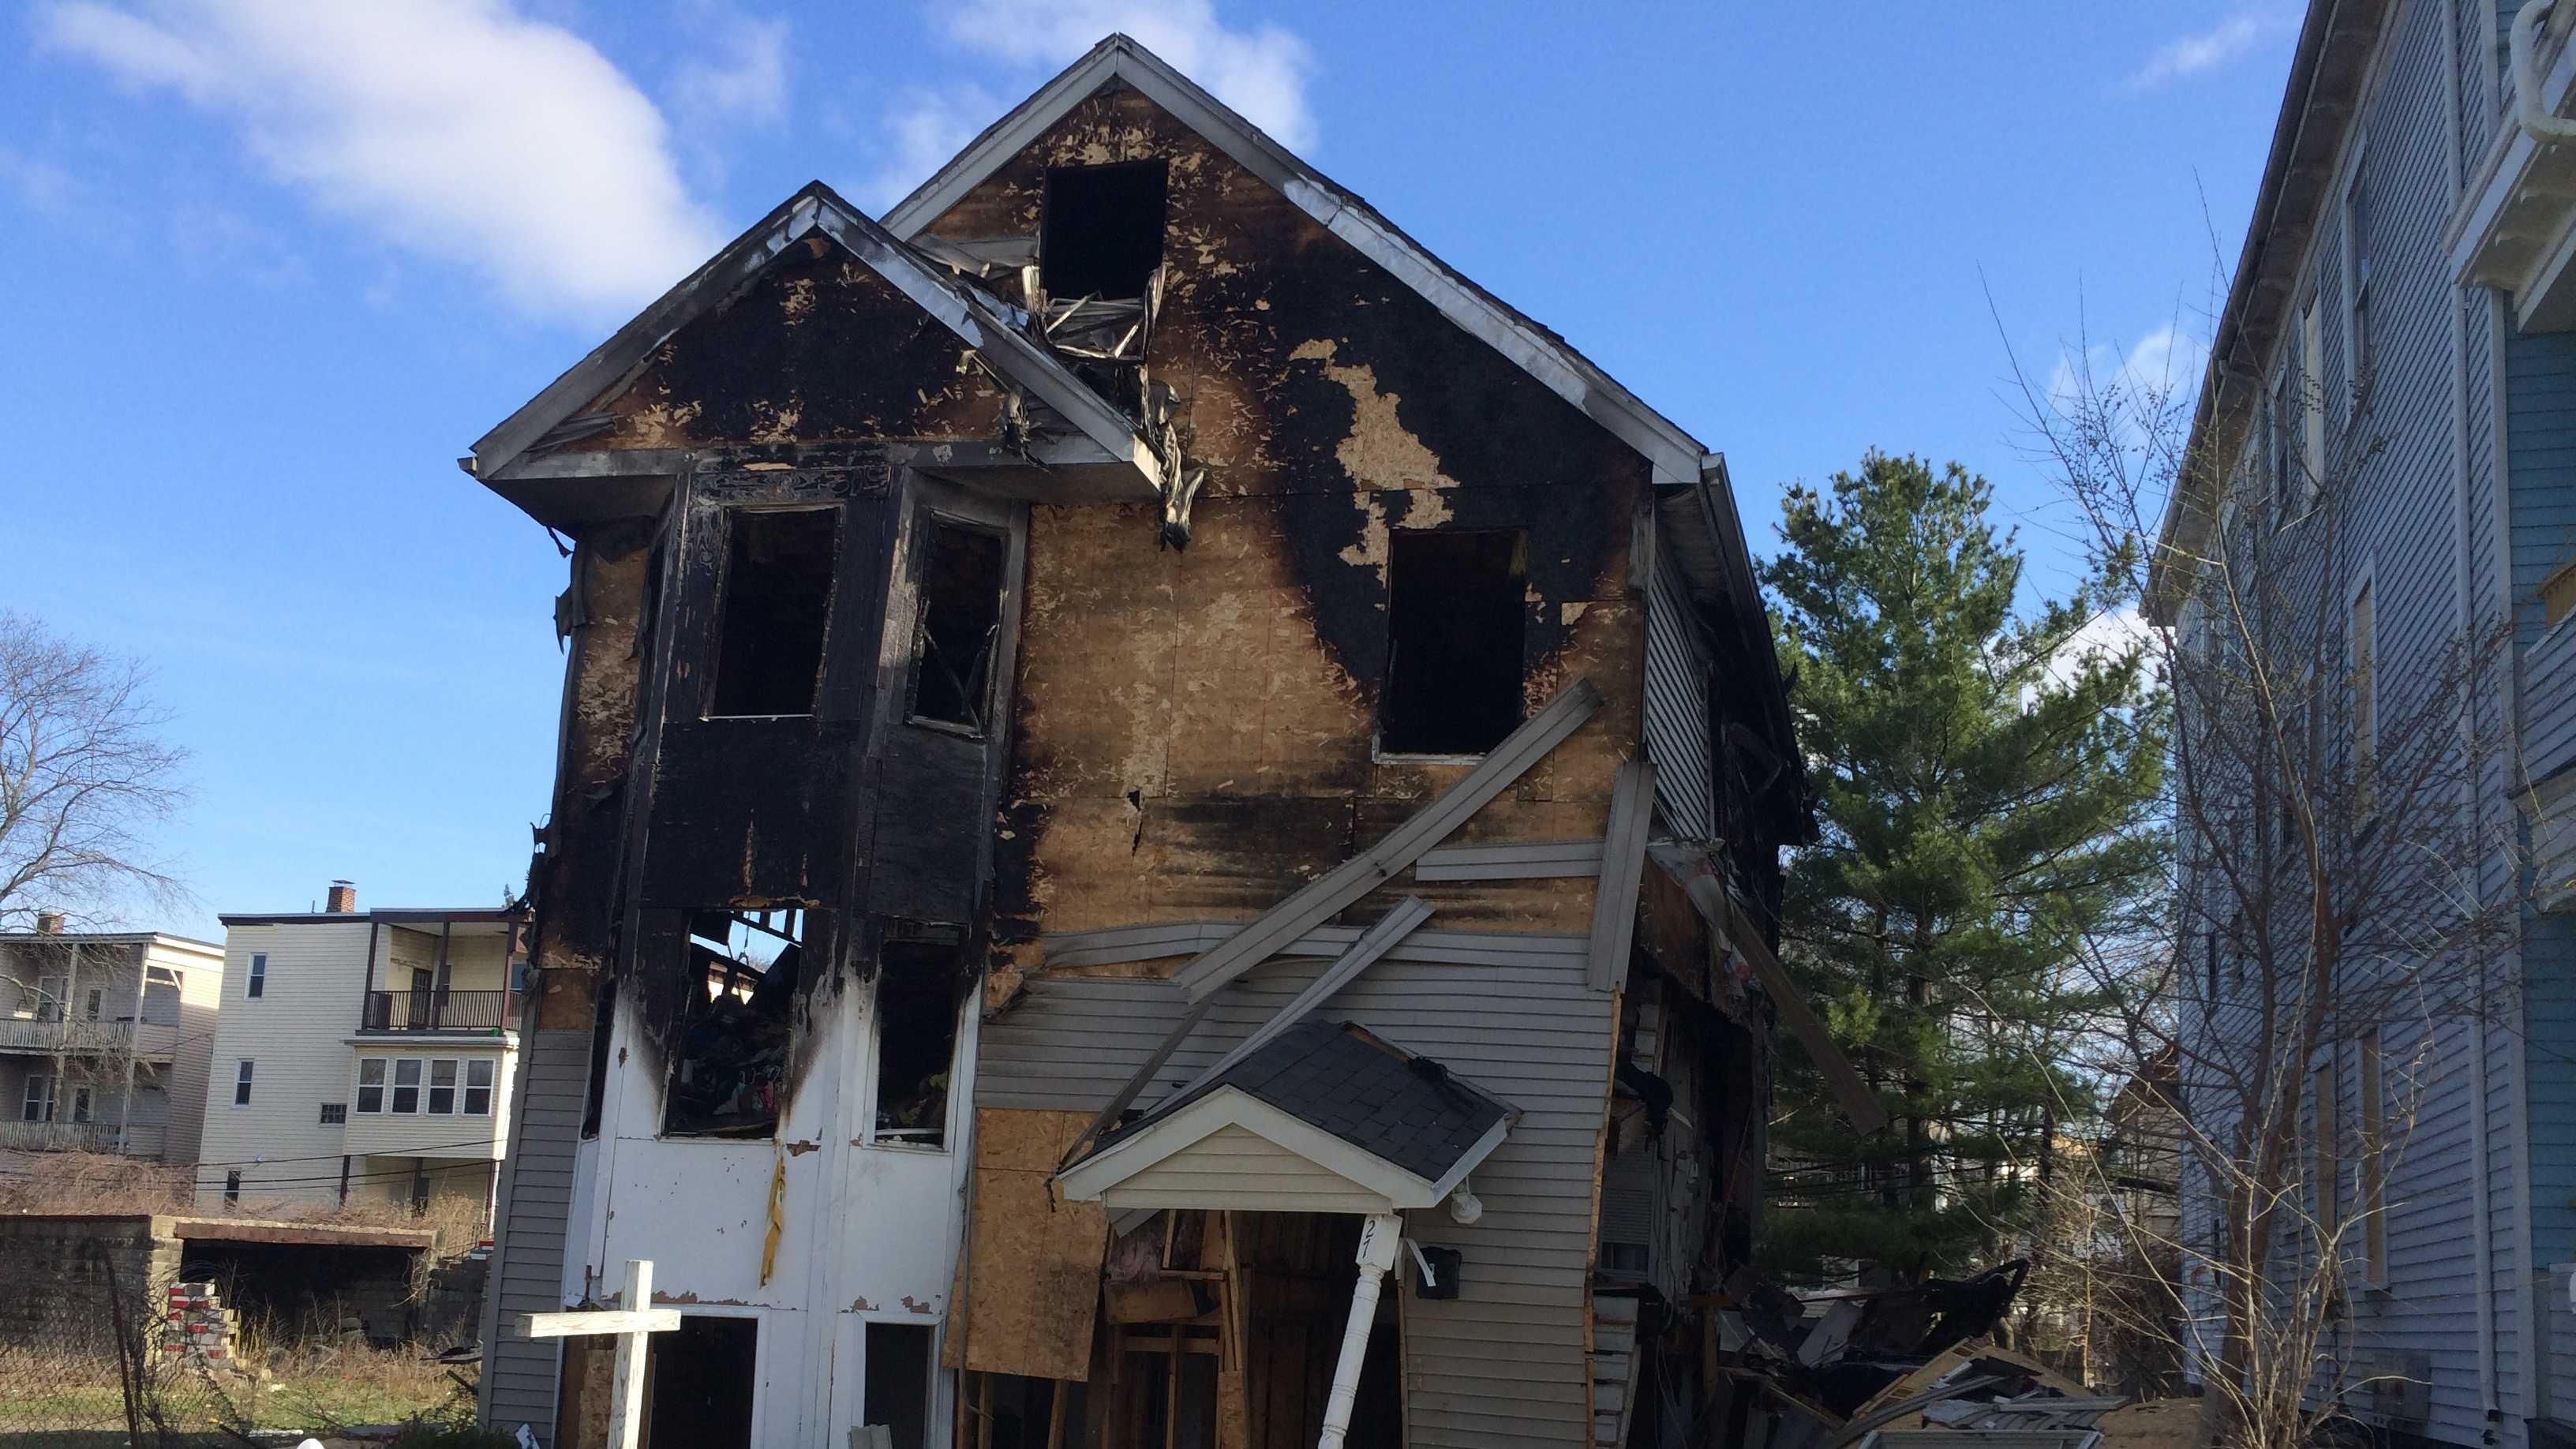 Dorchester explosion day 4.17